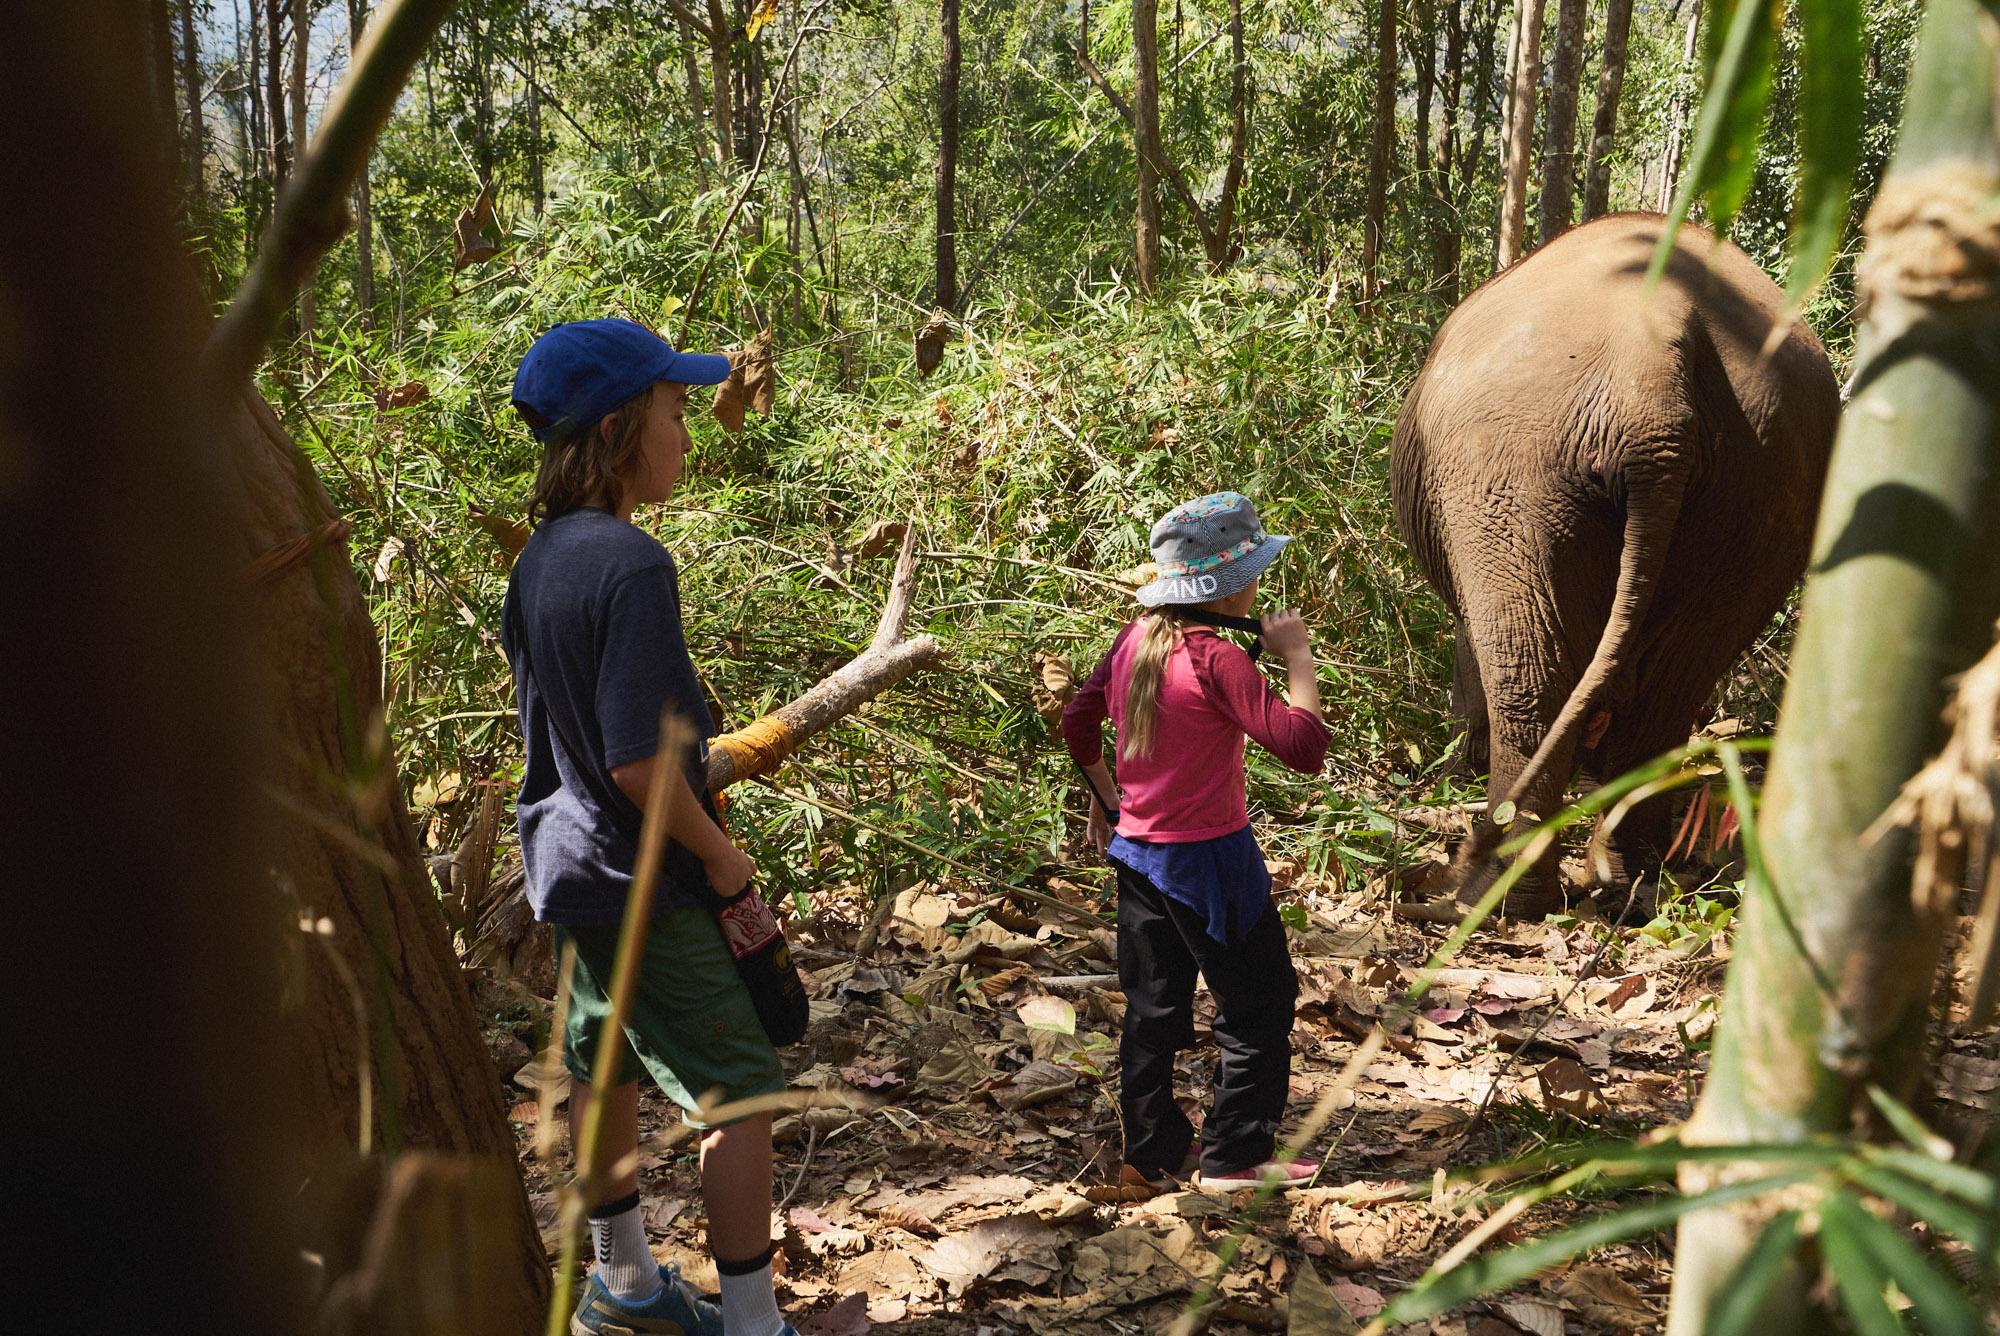 wesley_elephant_park_thailand-16